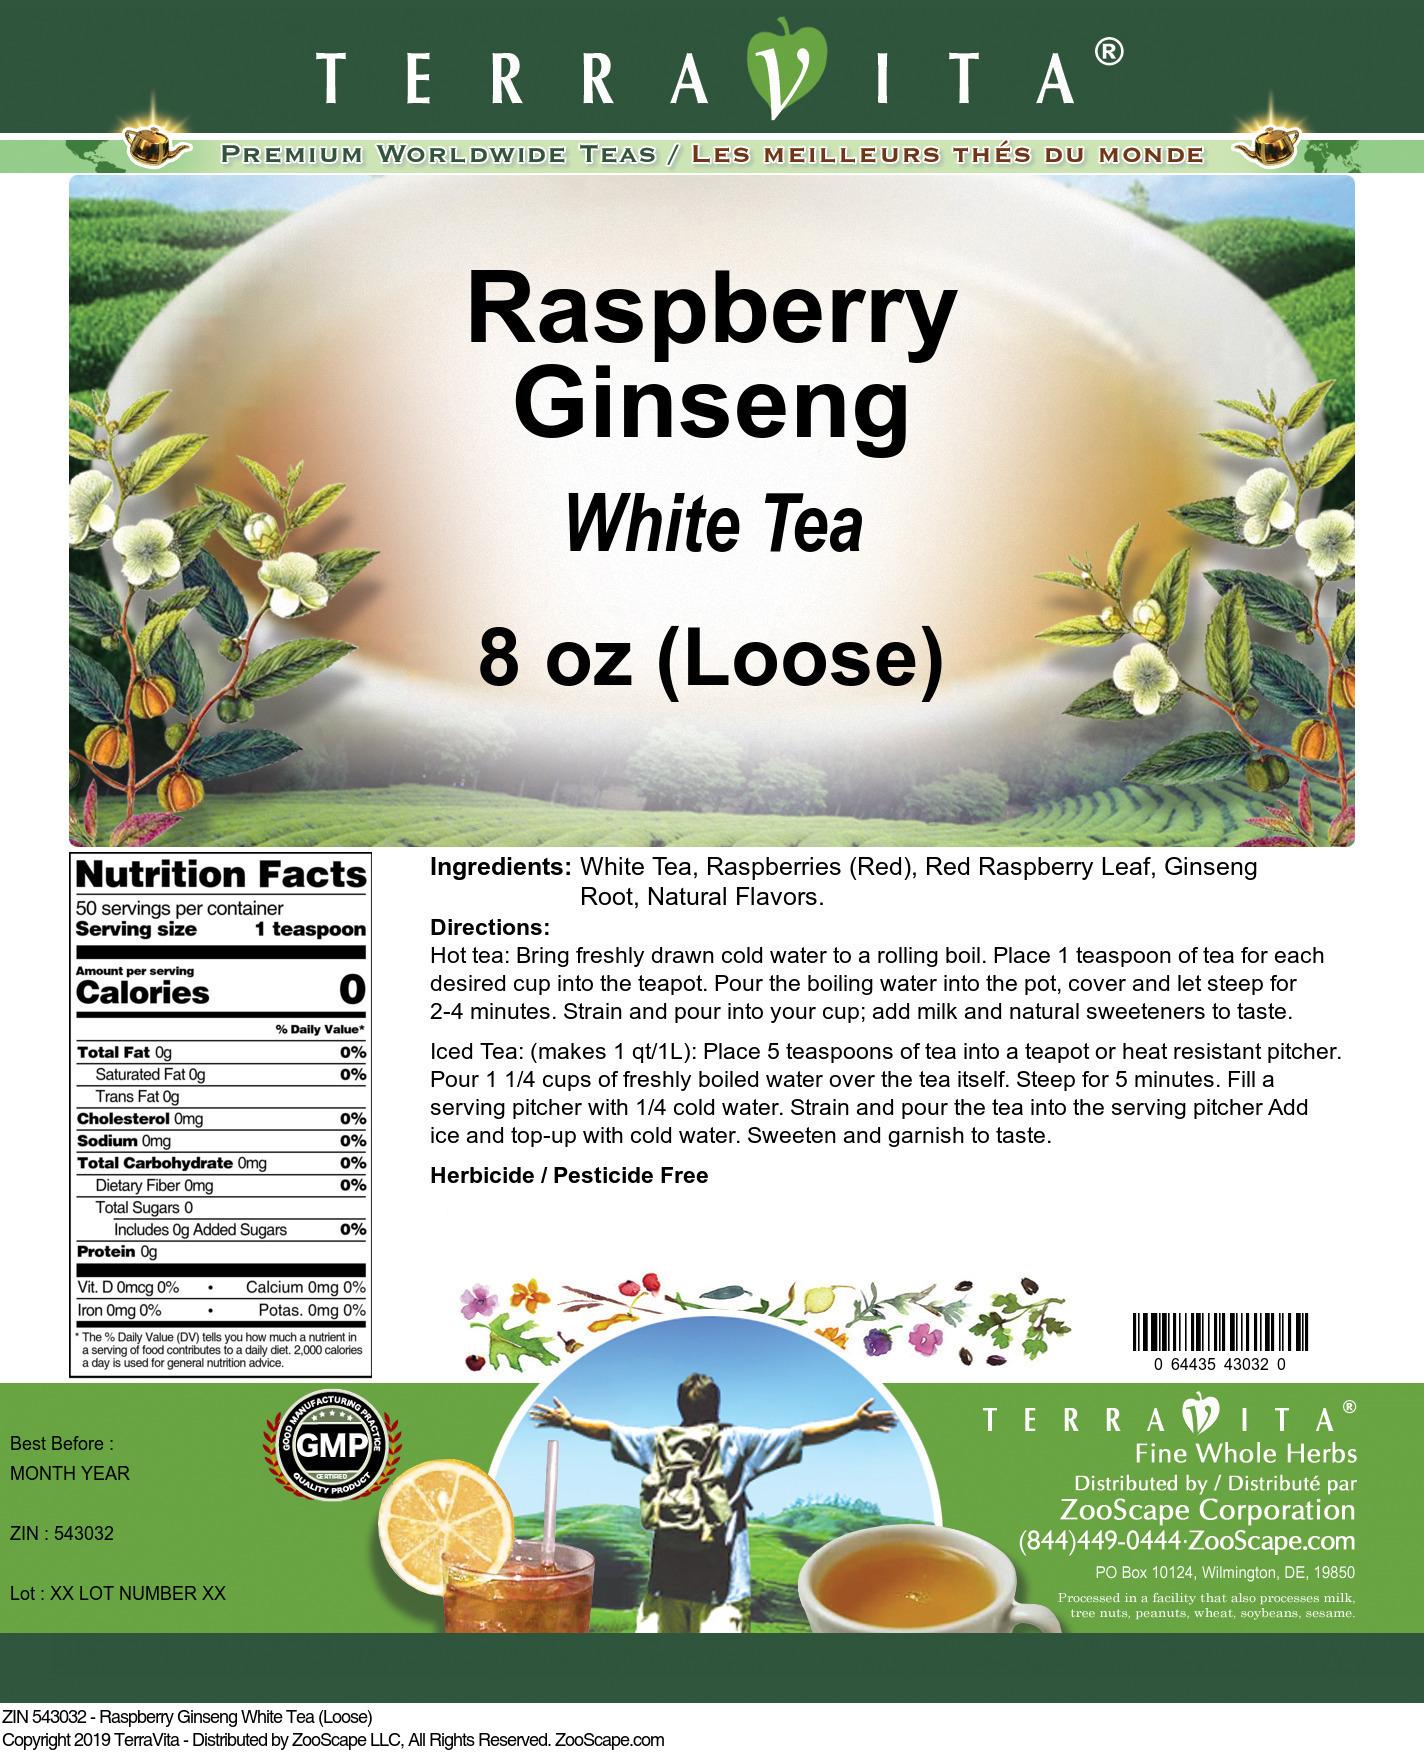 Raspberry Ginseng White Tea (Loose)